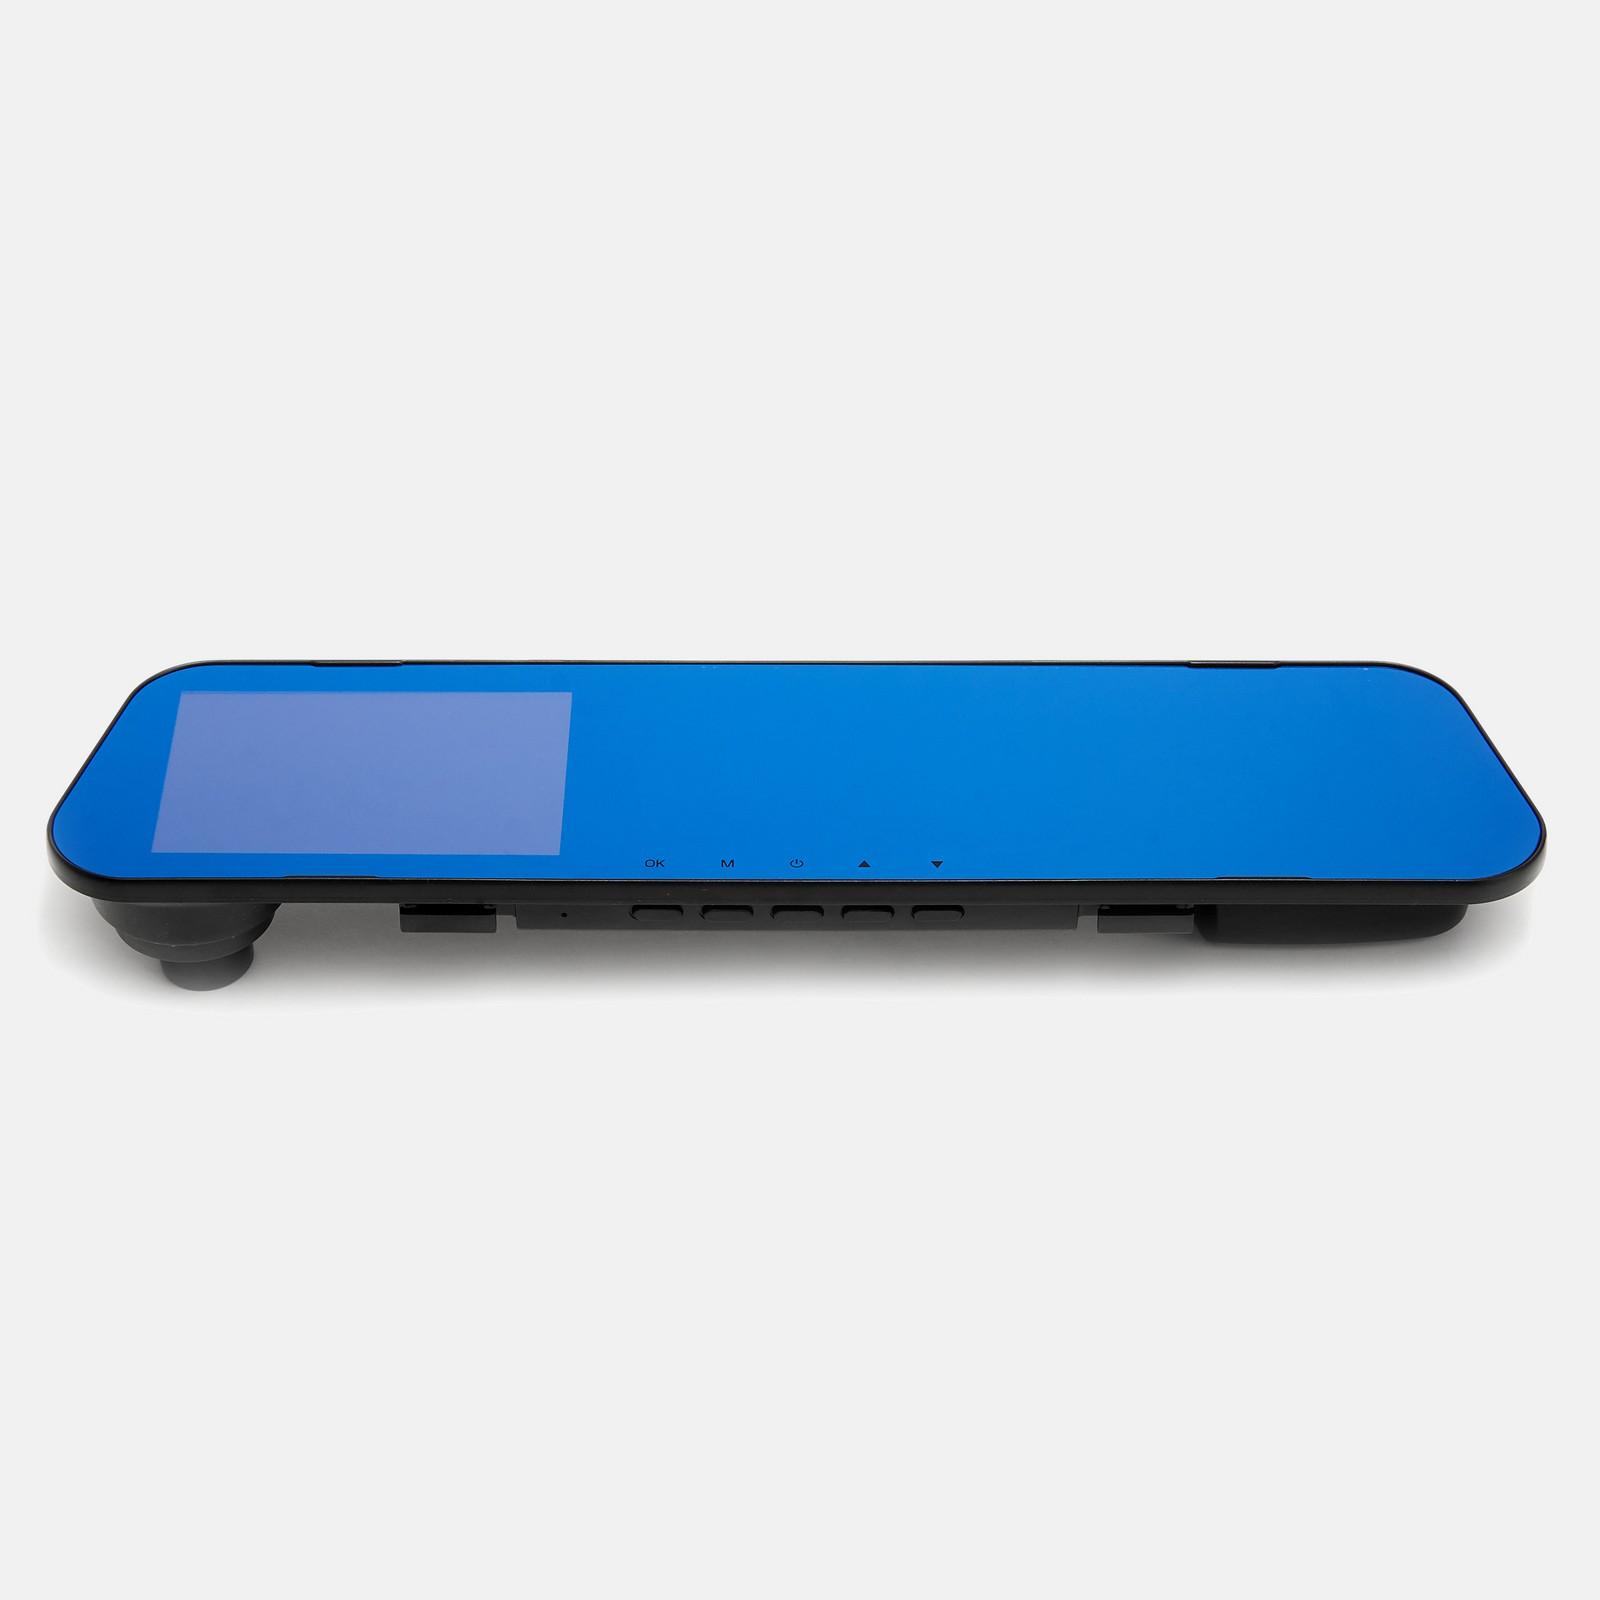 Видеорегистратор зеркало заднего вида Vehicle BlackBox Full HD, 2 камеры, версия 1.0